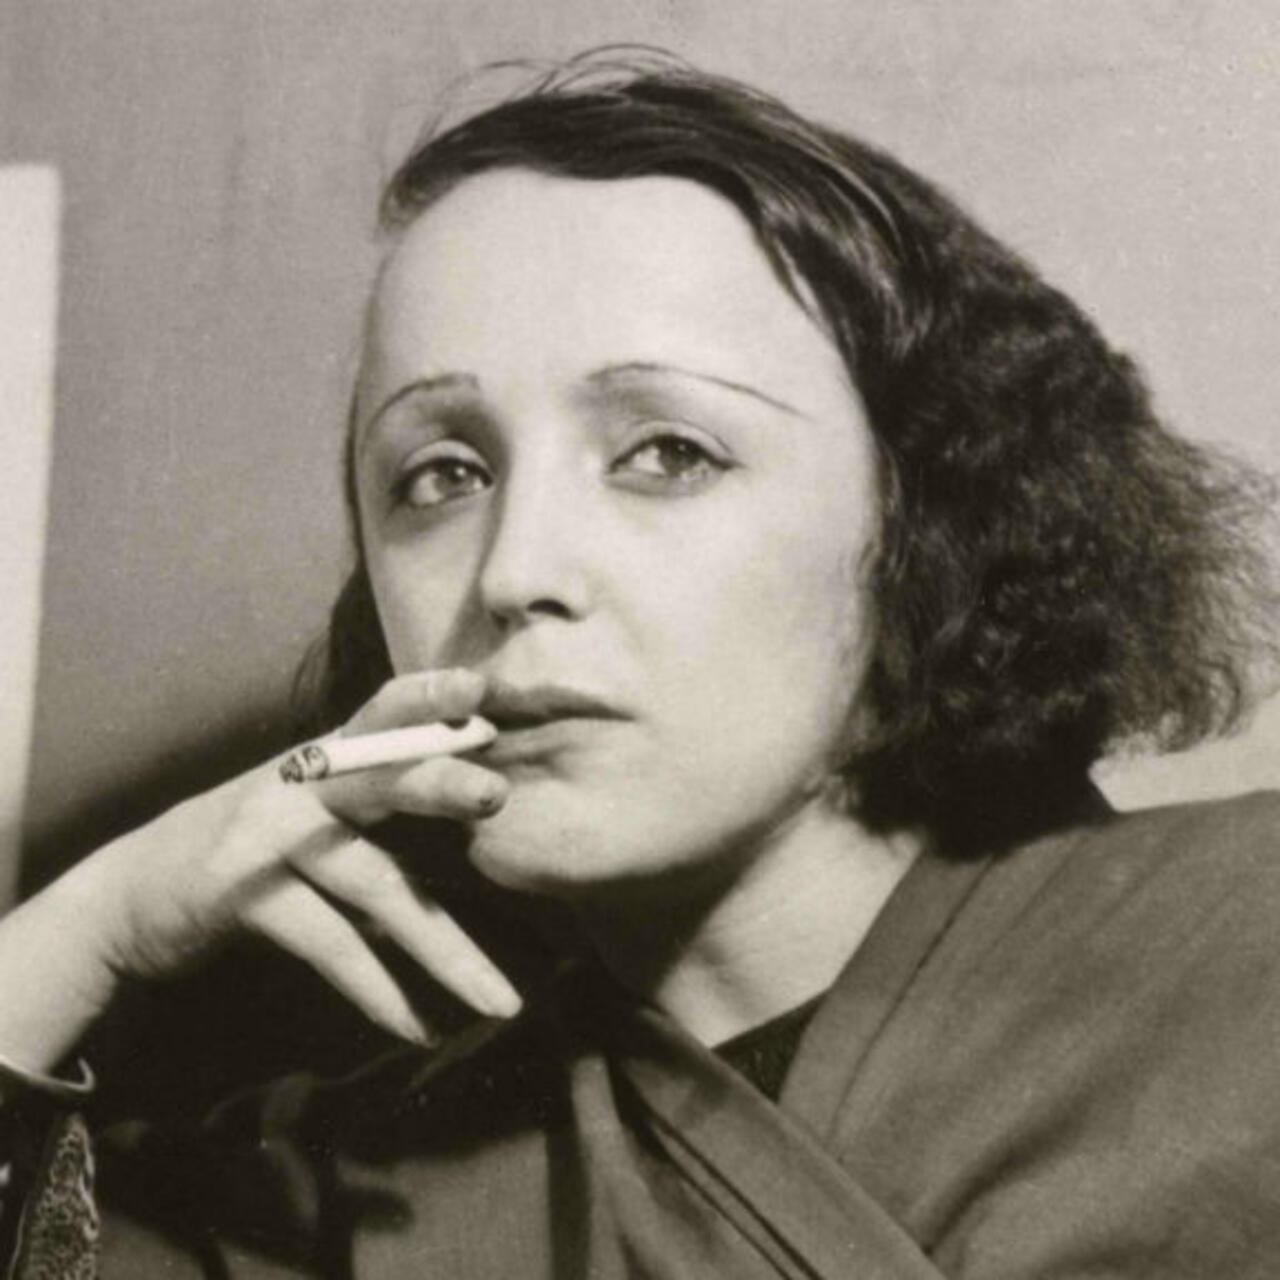 New Paris Exhibit Celebrates 100 Years Of Edith Piaf